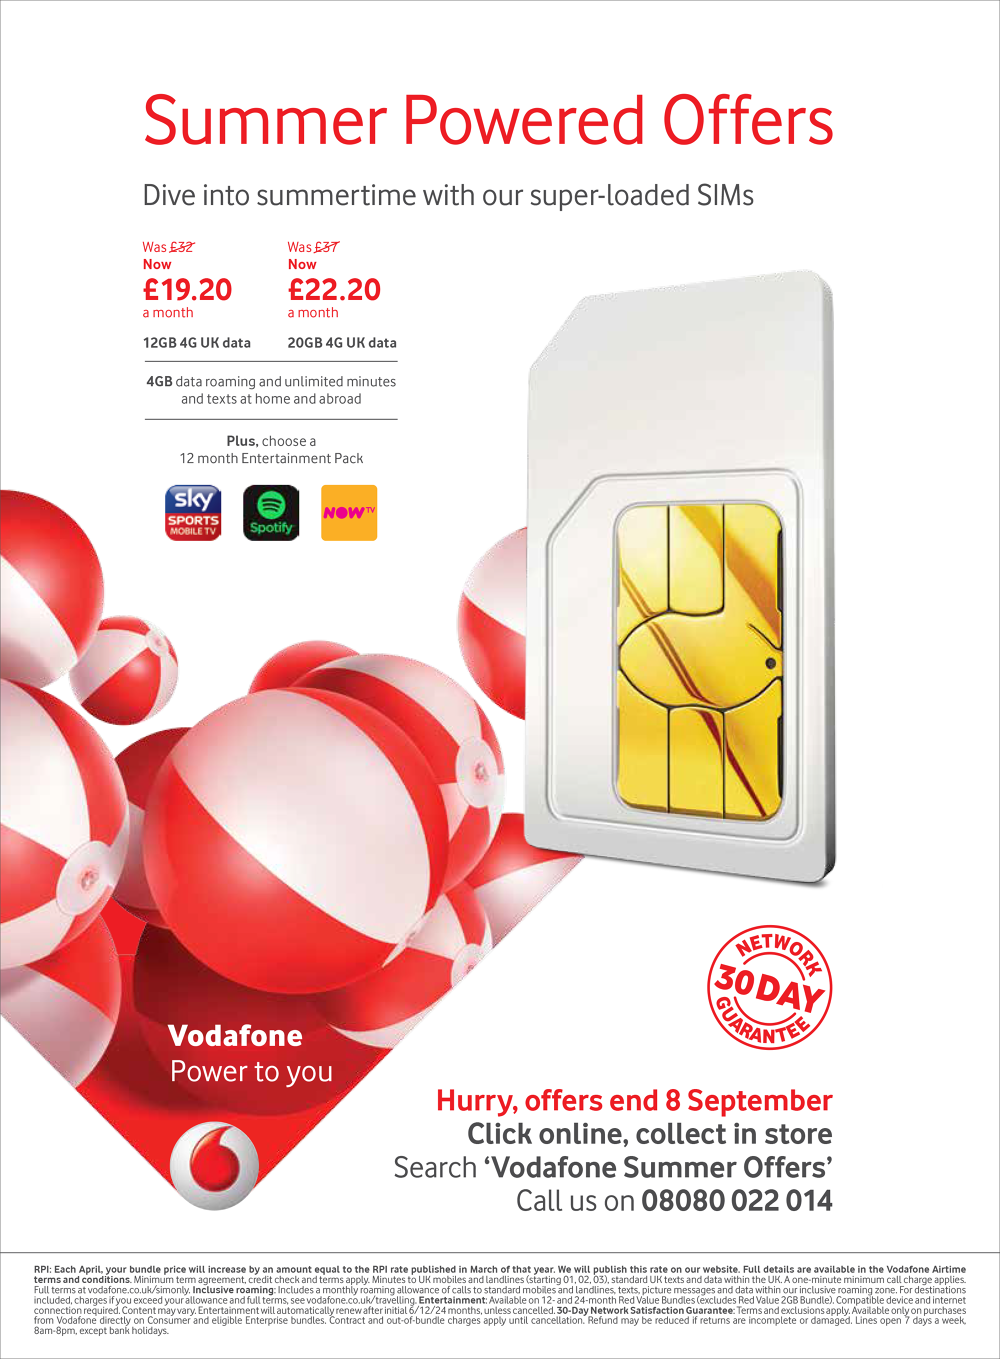 Vodafone Summer - Hamish Macaulay